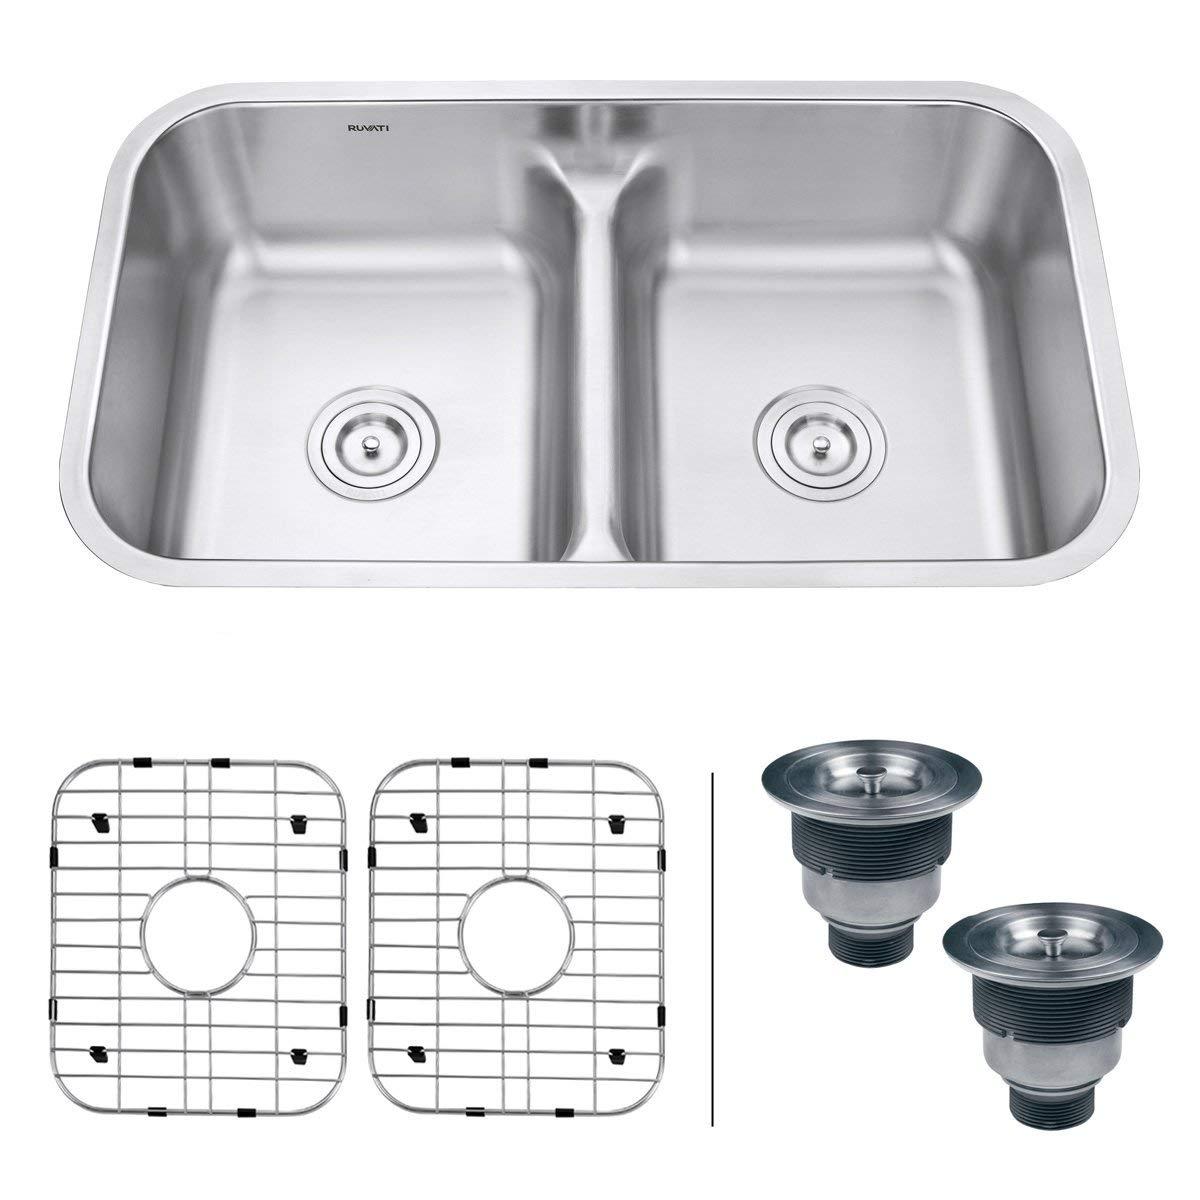 Ruvati 32-inch Low-Divide 50/50 Double Bowl Undermount 16 Gauge Stainless Steel Kitchen Sink - RVM4350 (Renewed)